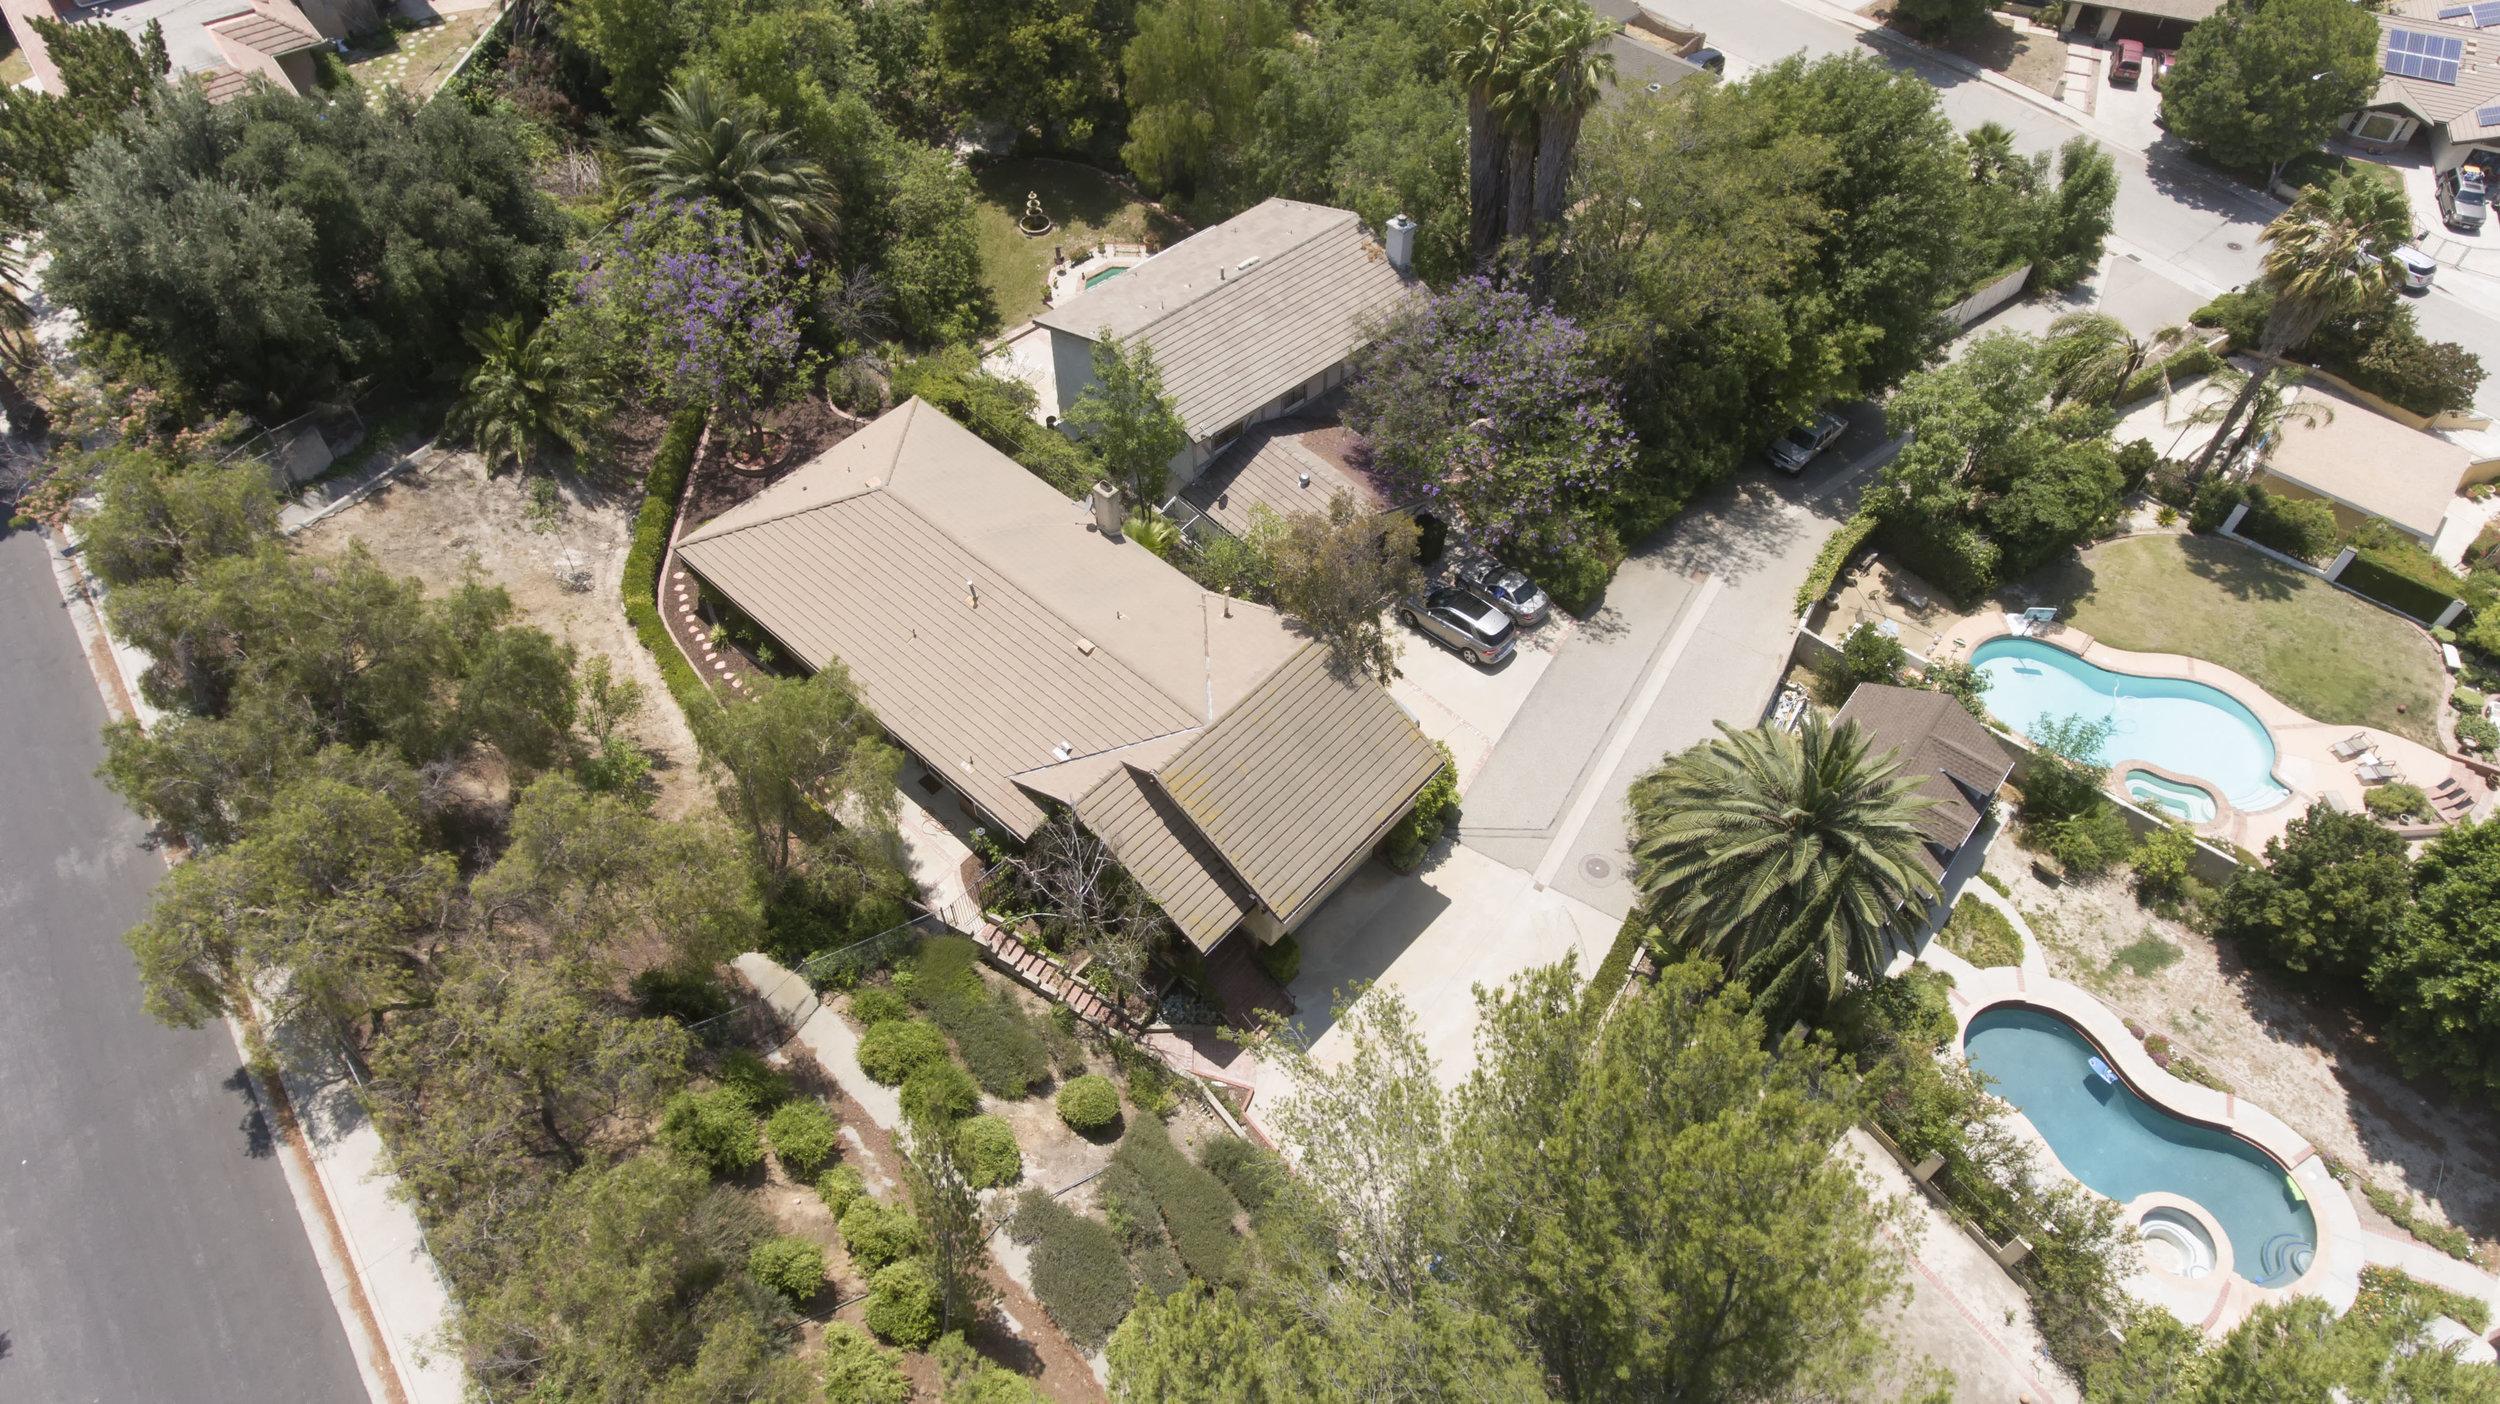 021 aerial 8832 Moorcroft Avenue West Hills For Sale Lease The Malibu Life Team Luxury Real Estate.jpg